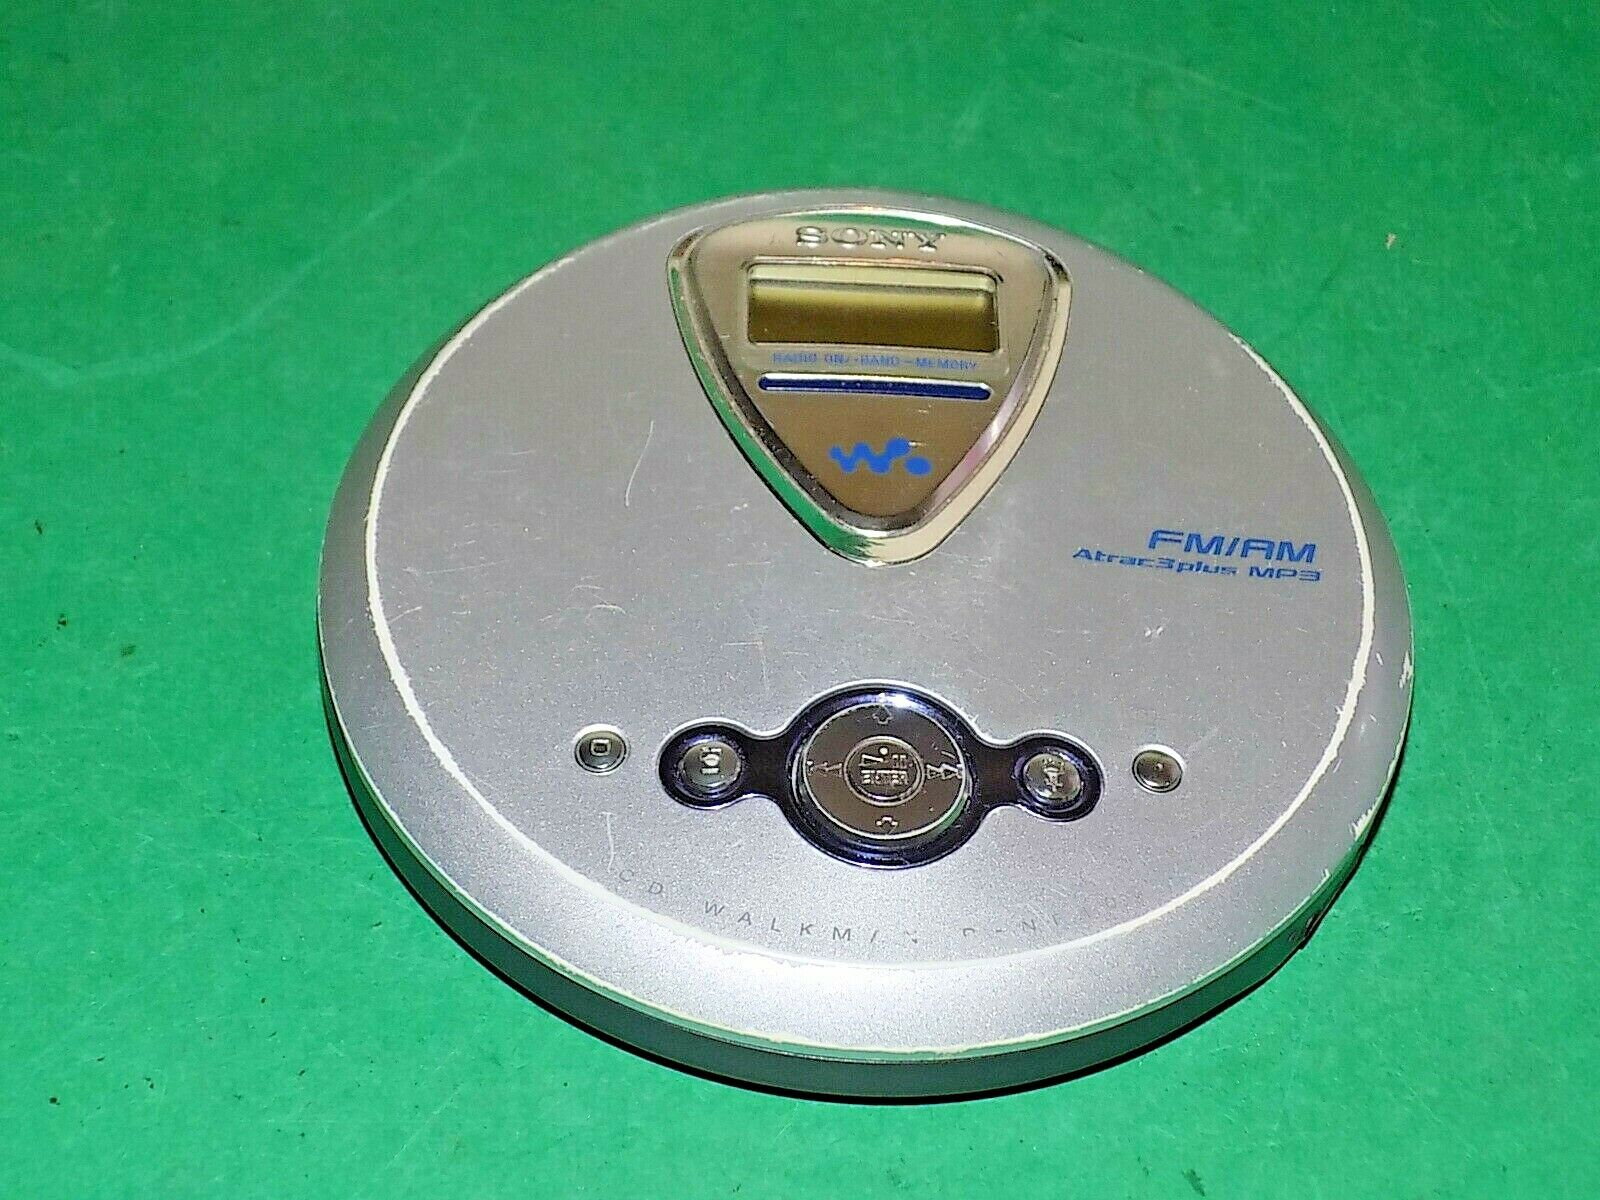 TV FM Sony D-NF400 ATRAC Walkman Portable CD Player with Digital AM Weather Tuner